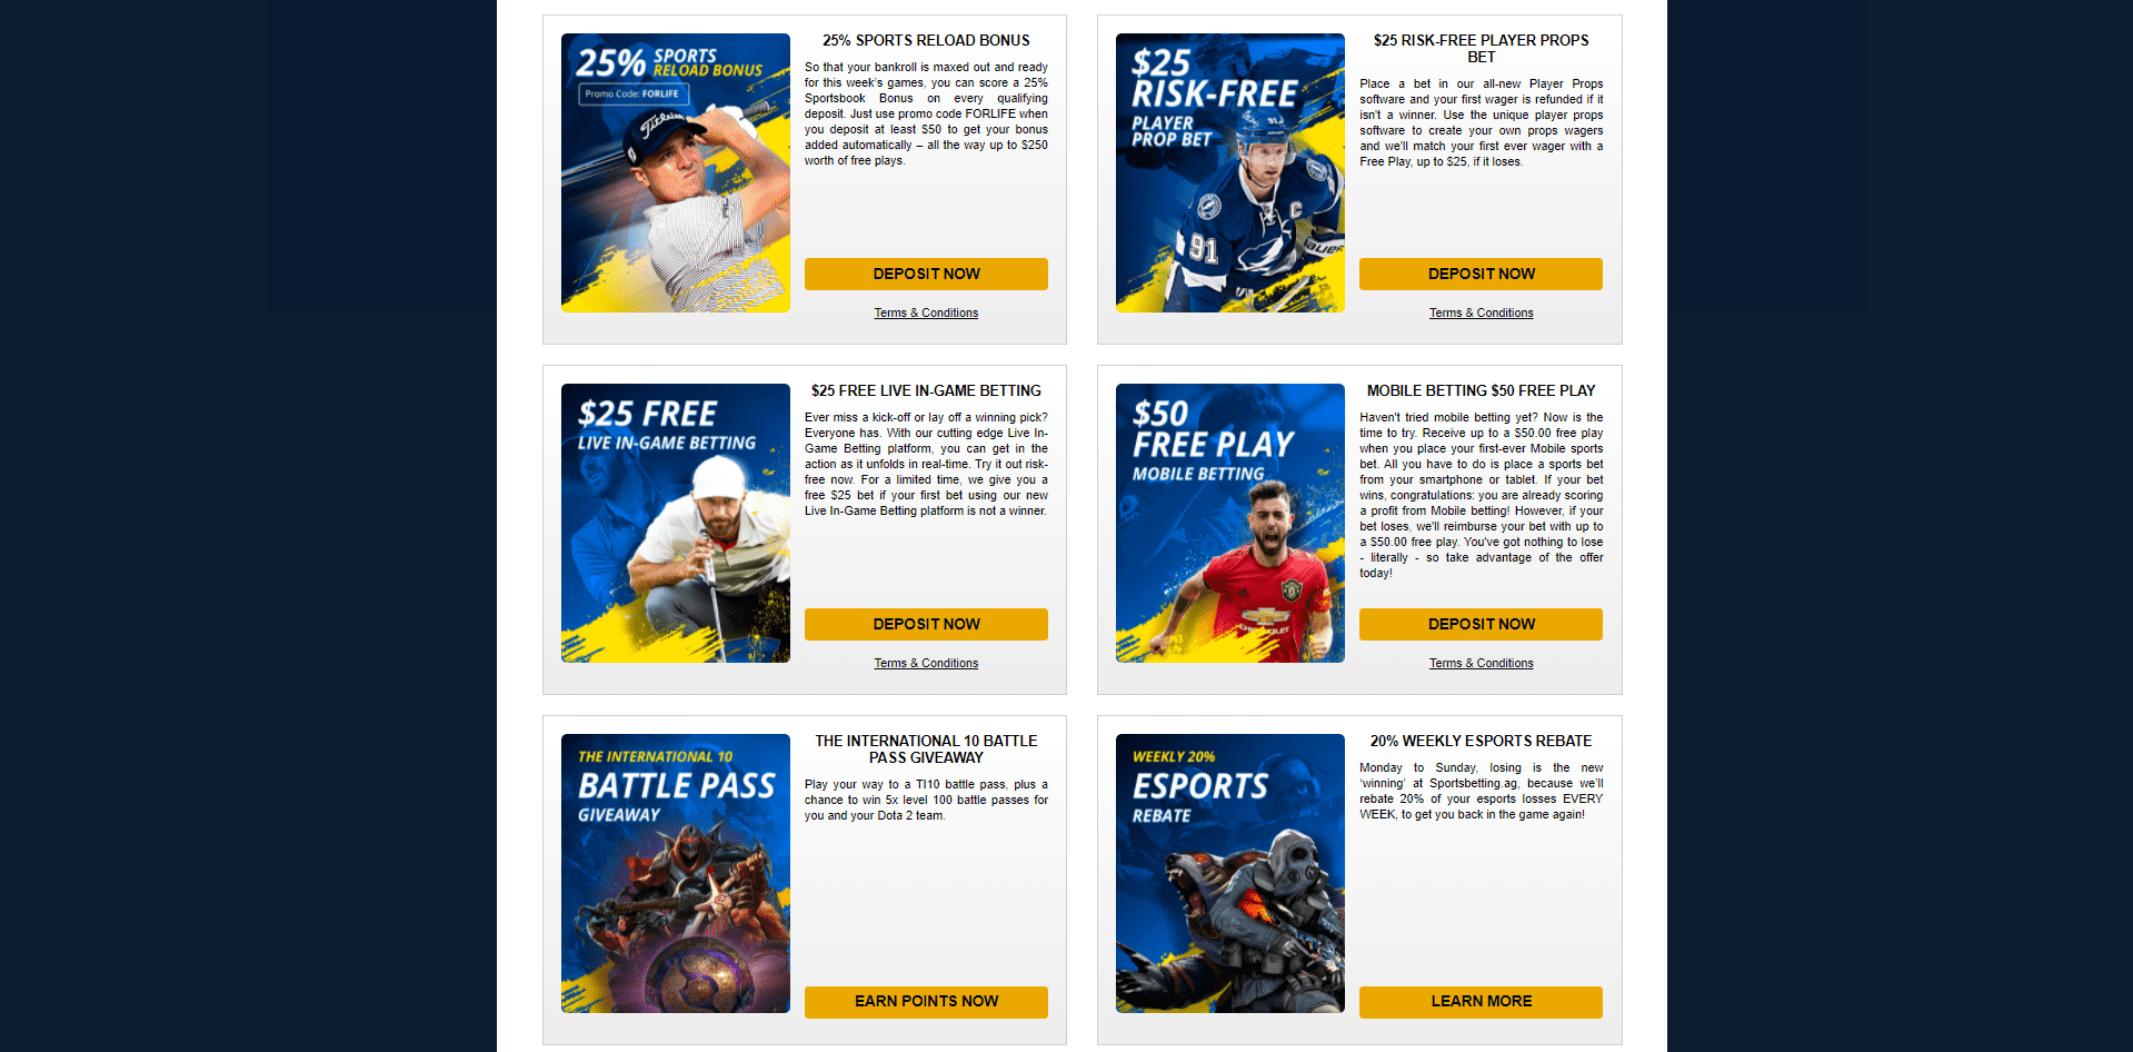 Sportsbetting.ag sports bonuses